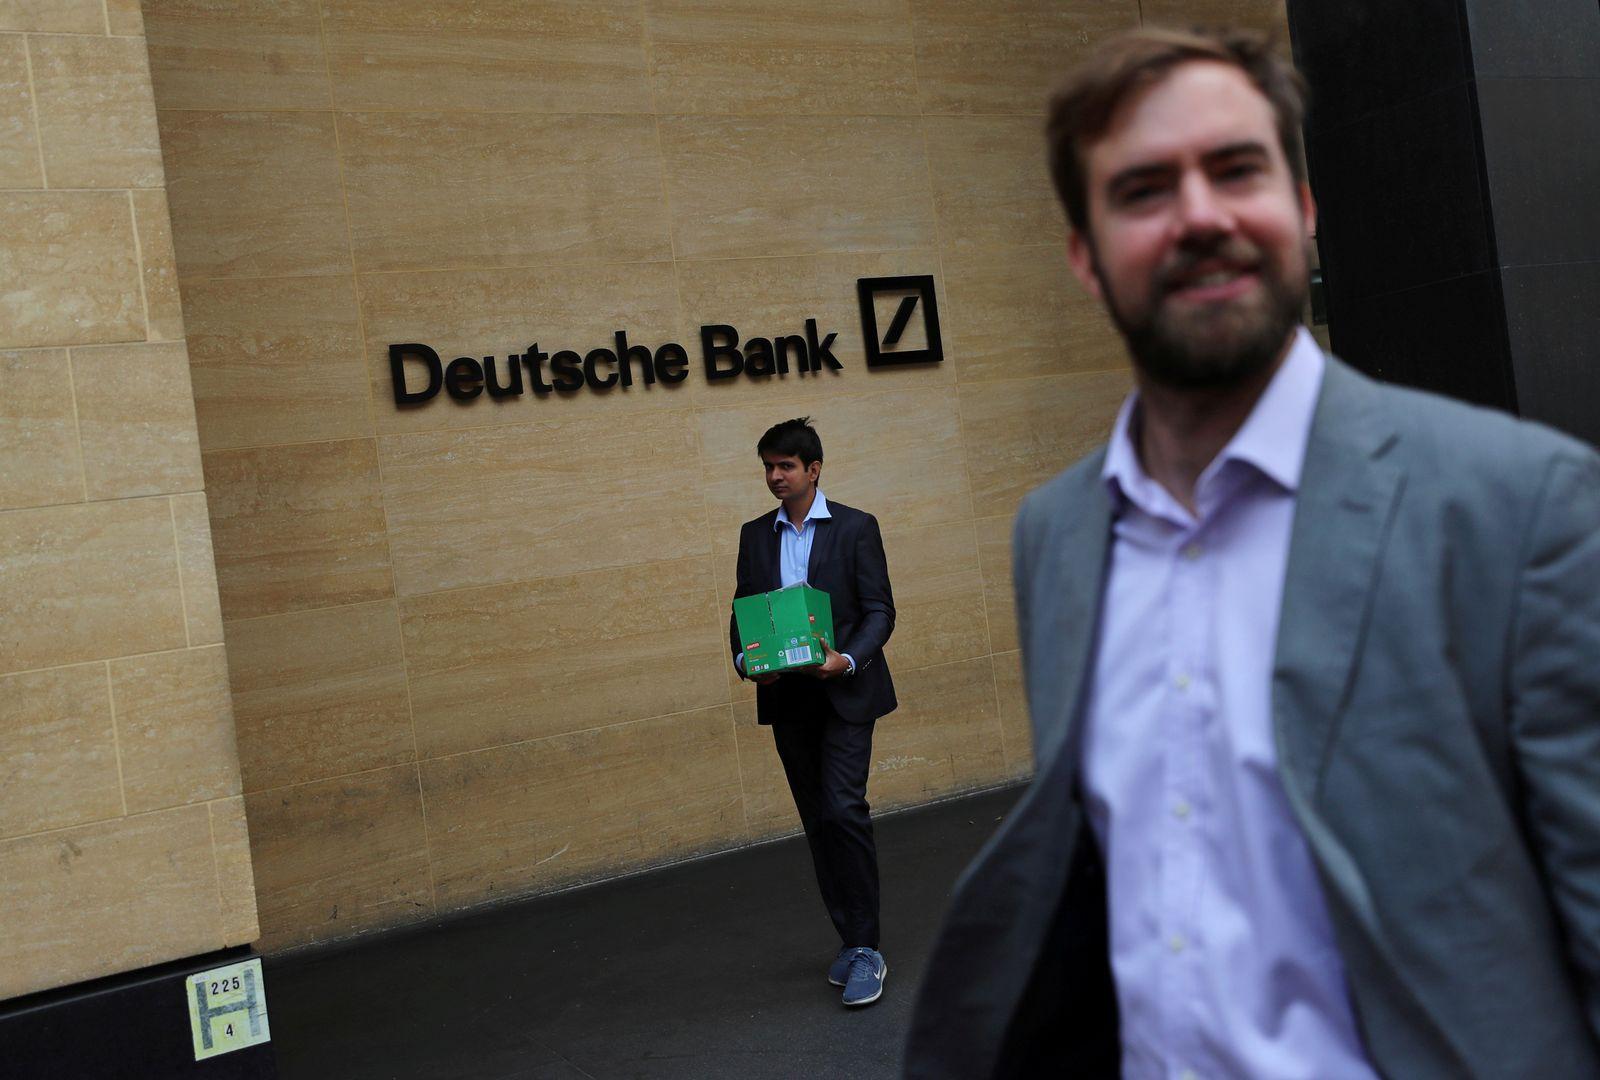 Deutsche Bank / Entlassungen